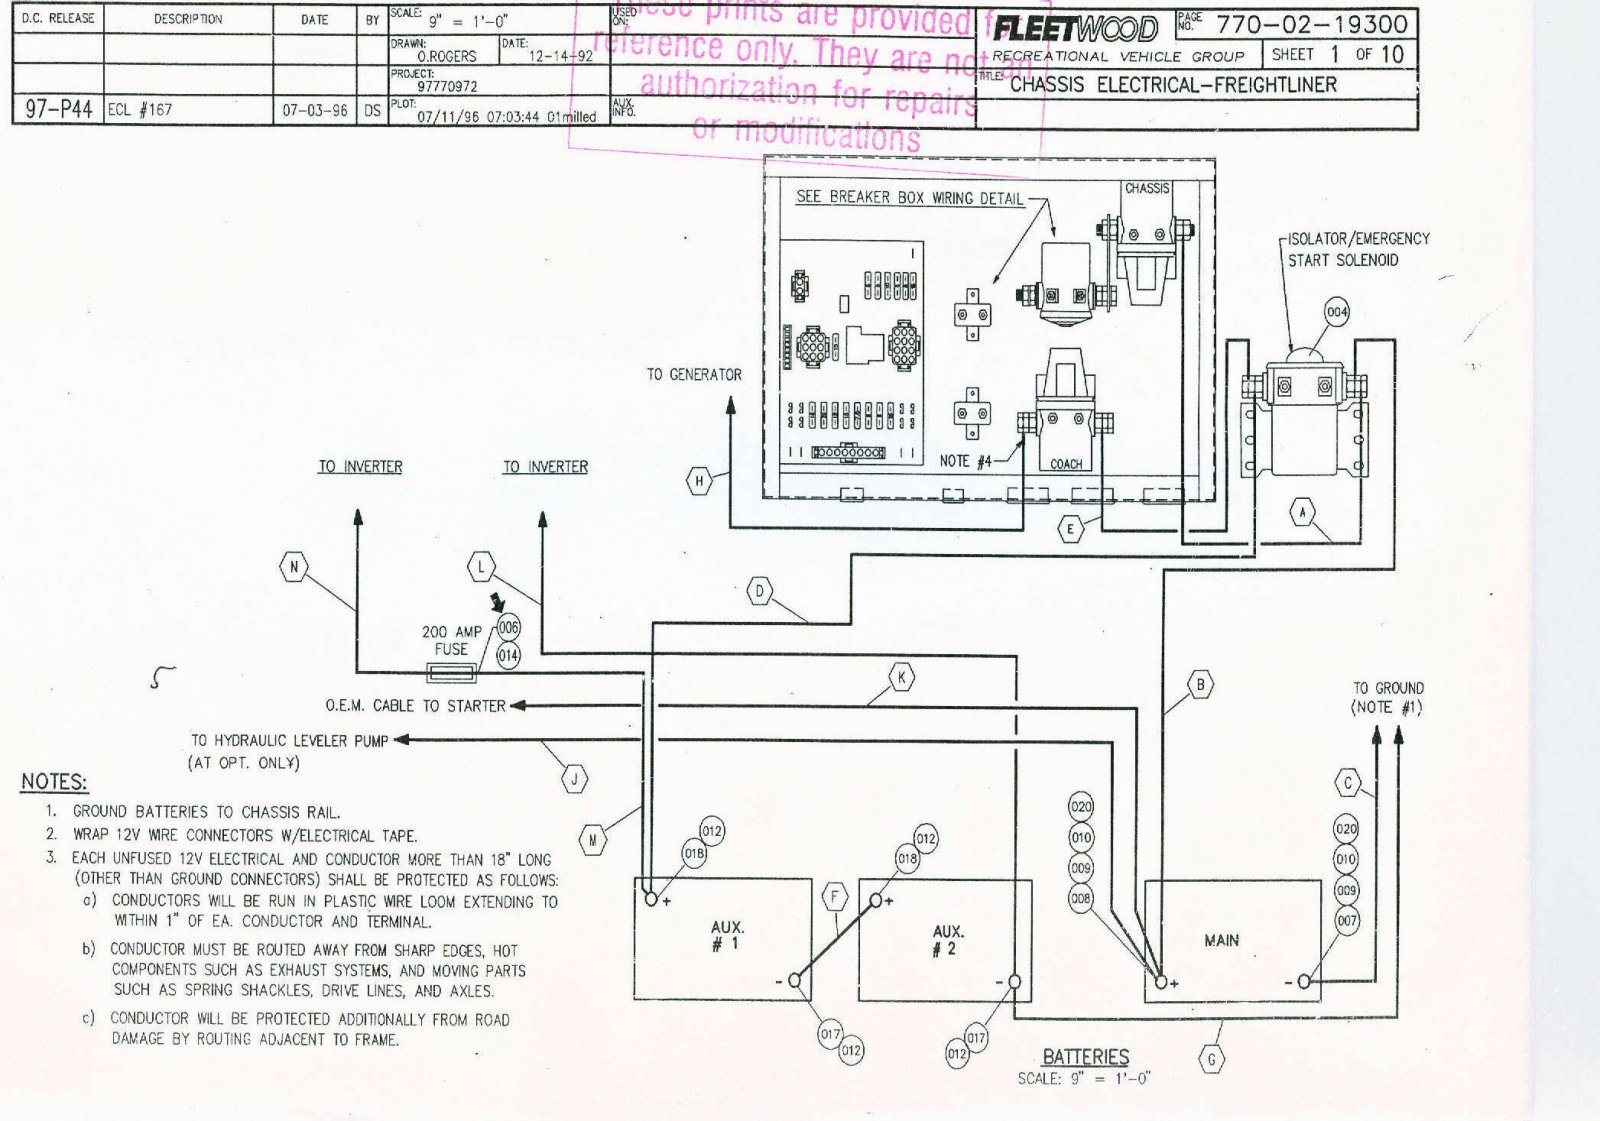 motorhome wiring schematic motorhome image wiring motorhome electric ke wiring motorhome auto wiring diagram schematic on motorhome wiring schematic